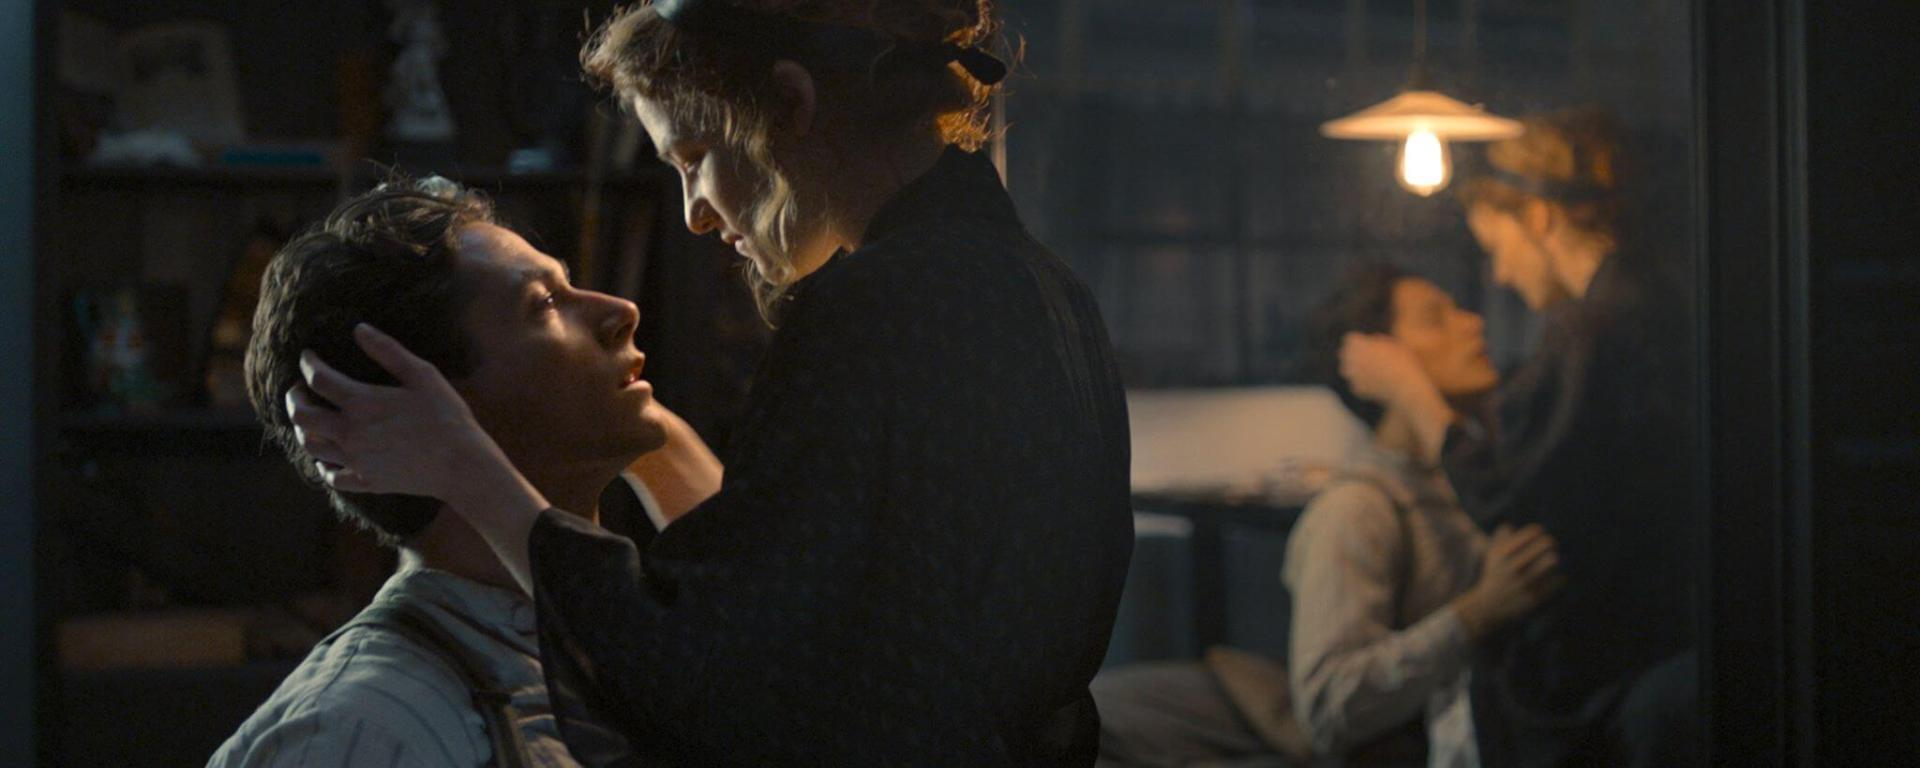 Egon-Schiele-Cinefatti